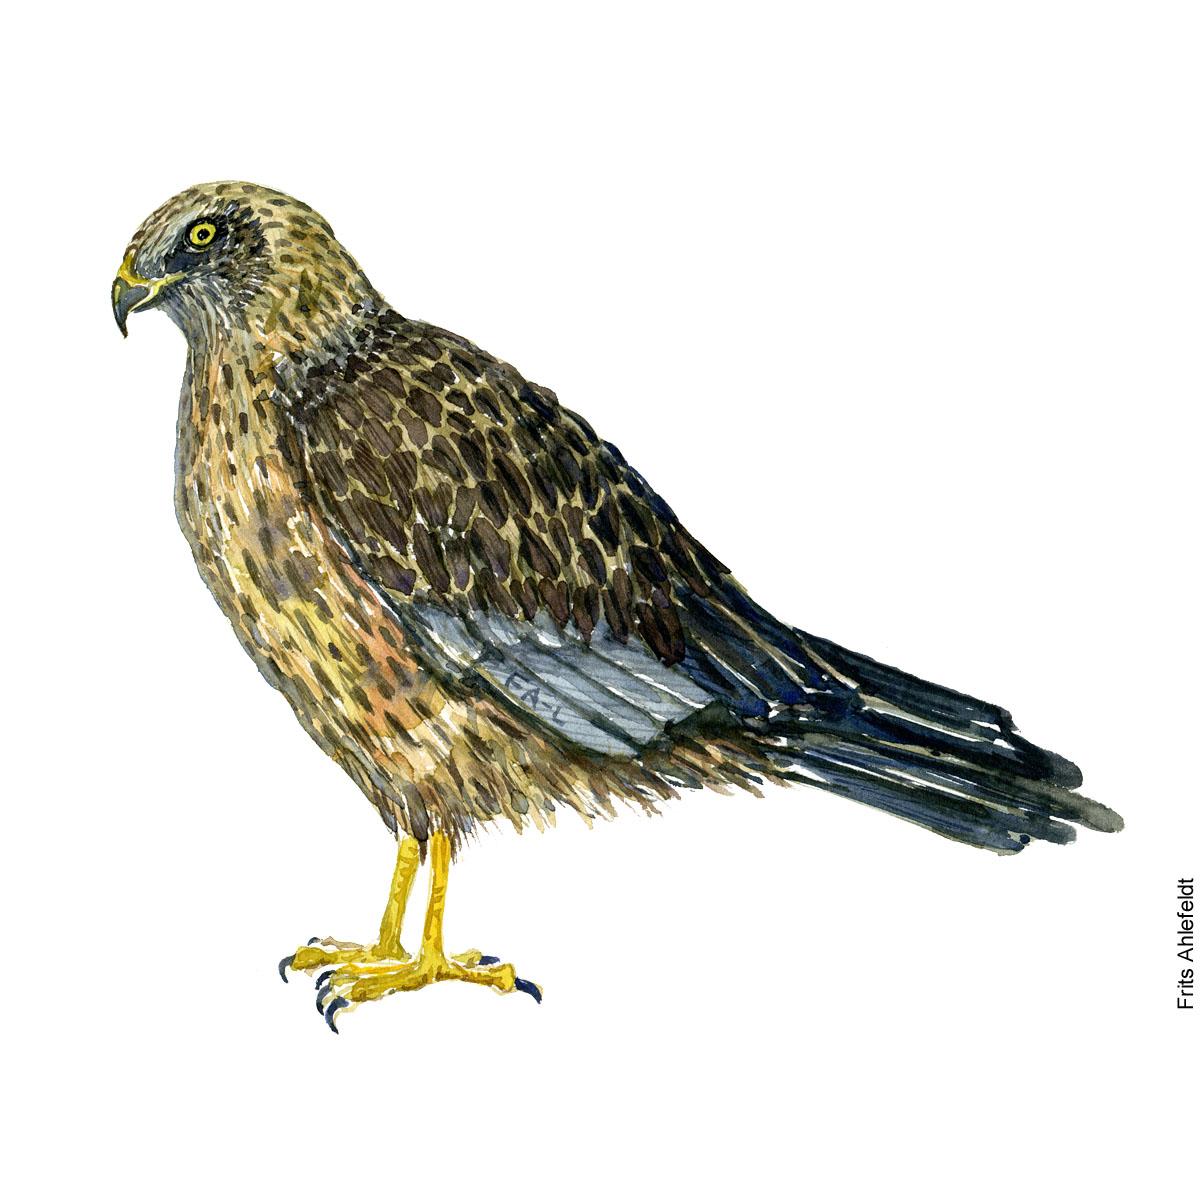 Roerhog - Western marsh harrier bird watercolor painting. Artwork by Frits Ahlefeldt. Fugle akvarel